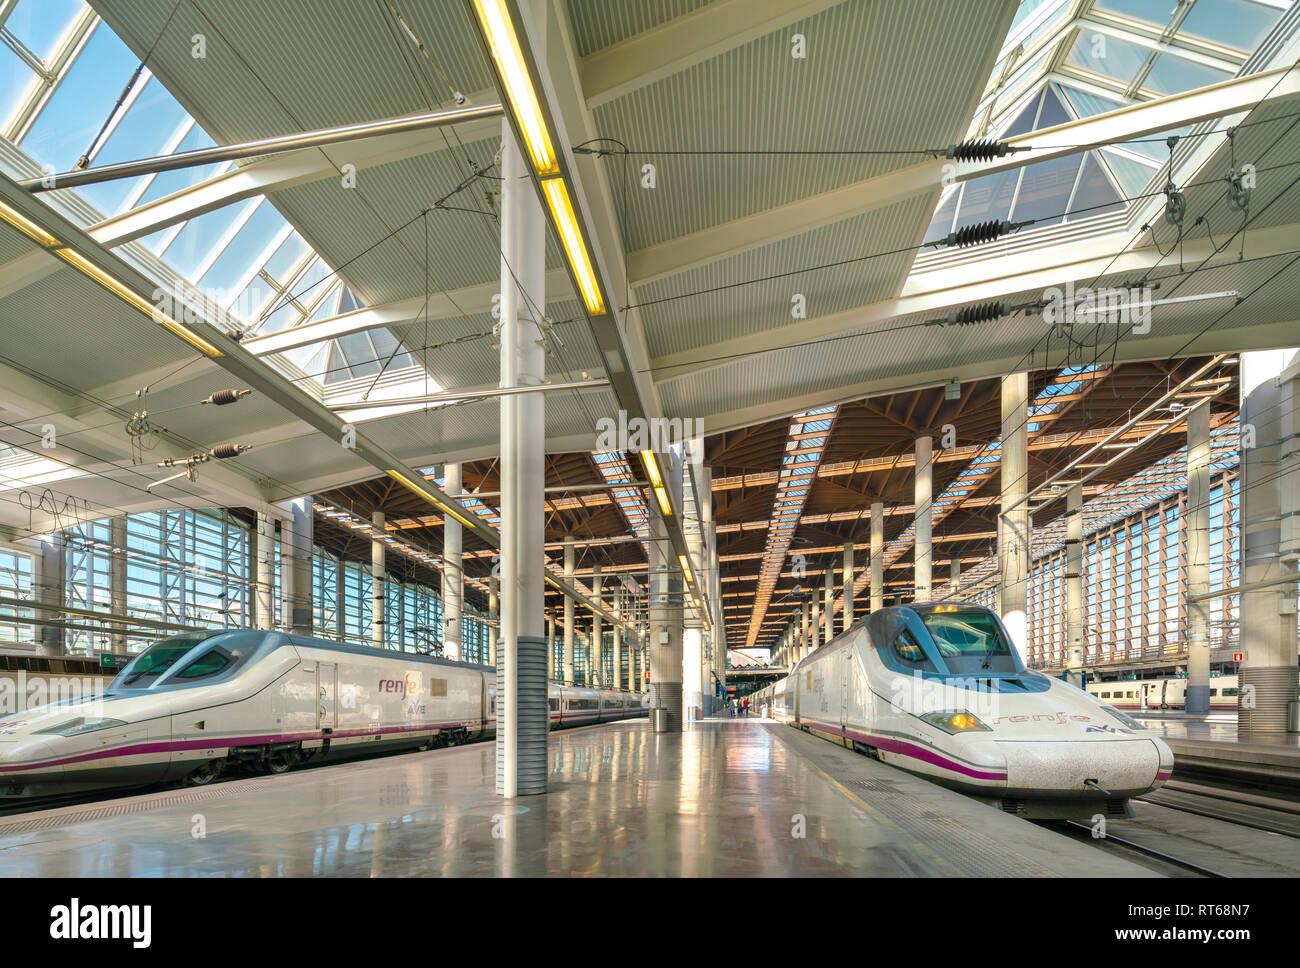 Madrid Atocha train station with AVE Class 102 high speed trains to Cordoba and Malaga. Estacion Puerta de Atocha railway station platform. - Stock Image